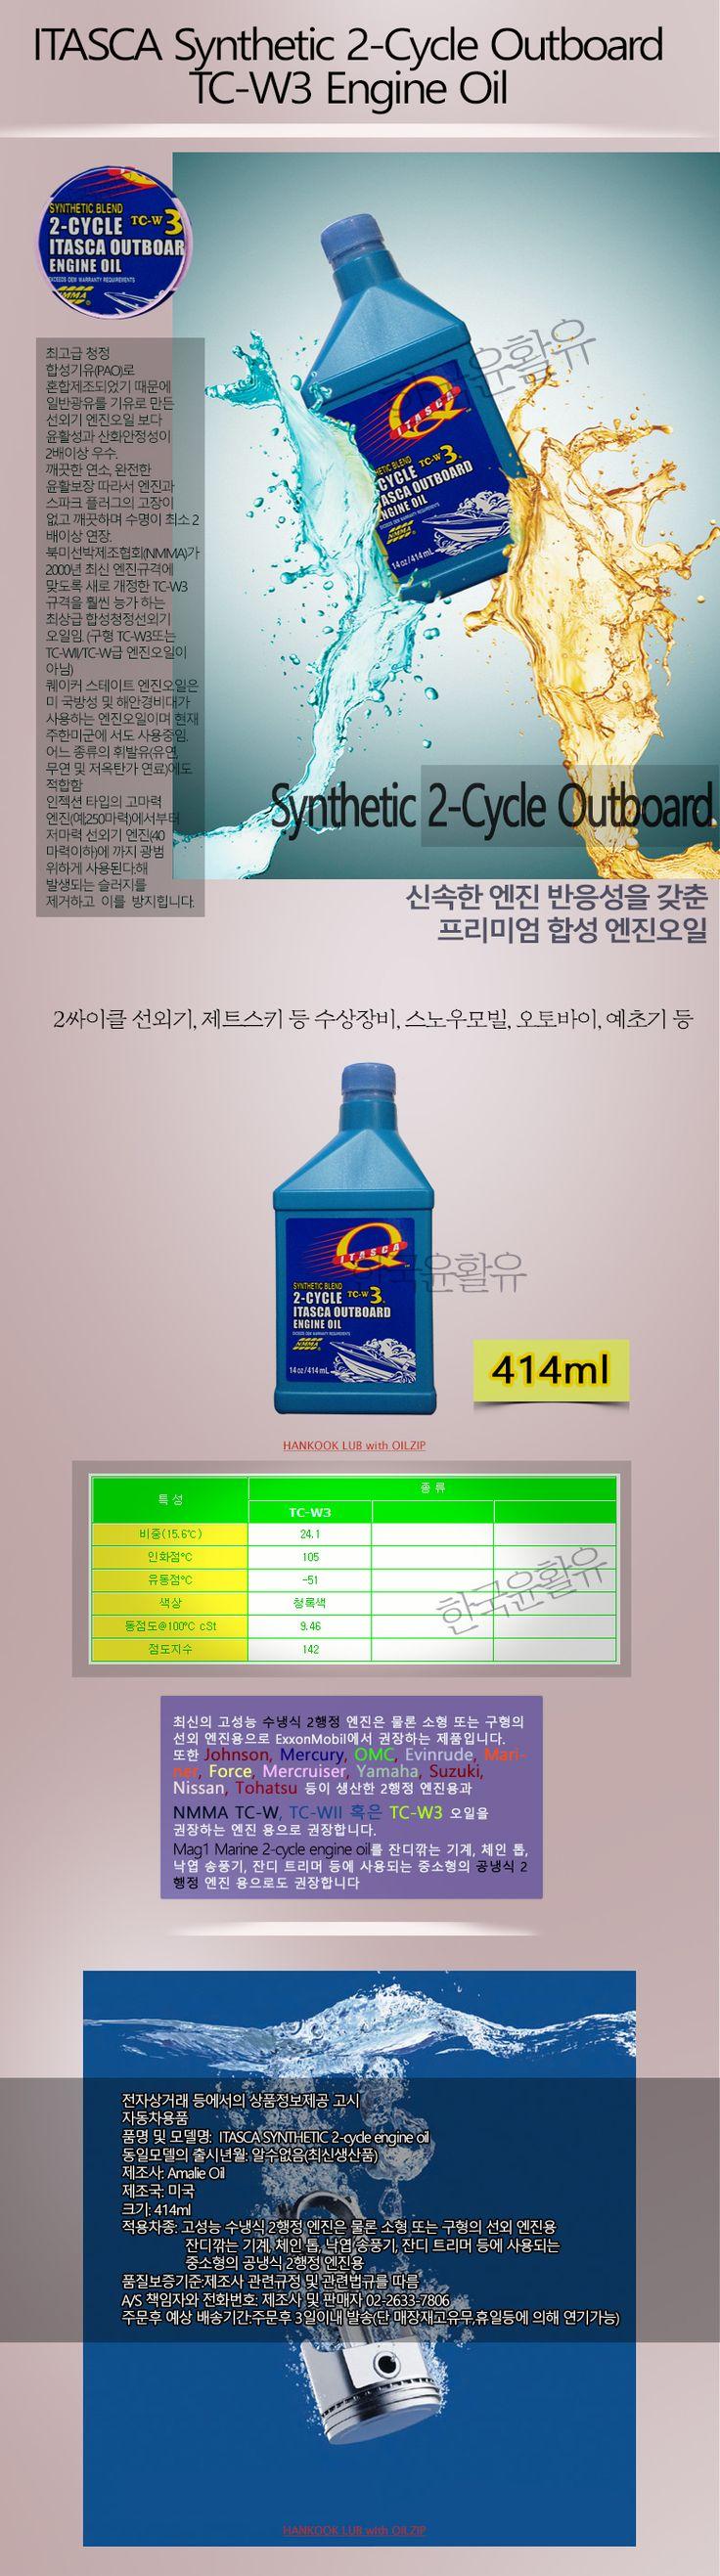 ITASCA 신세틱아웃보드 선외기 모터보트 2행정용 엔진오일[414ml], 한국윤활유 : 스토어팜